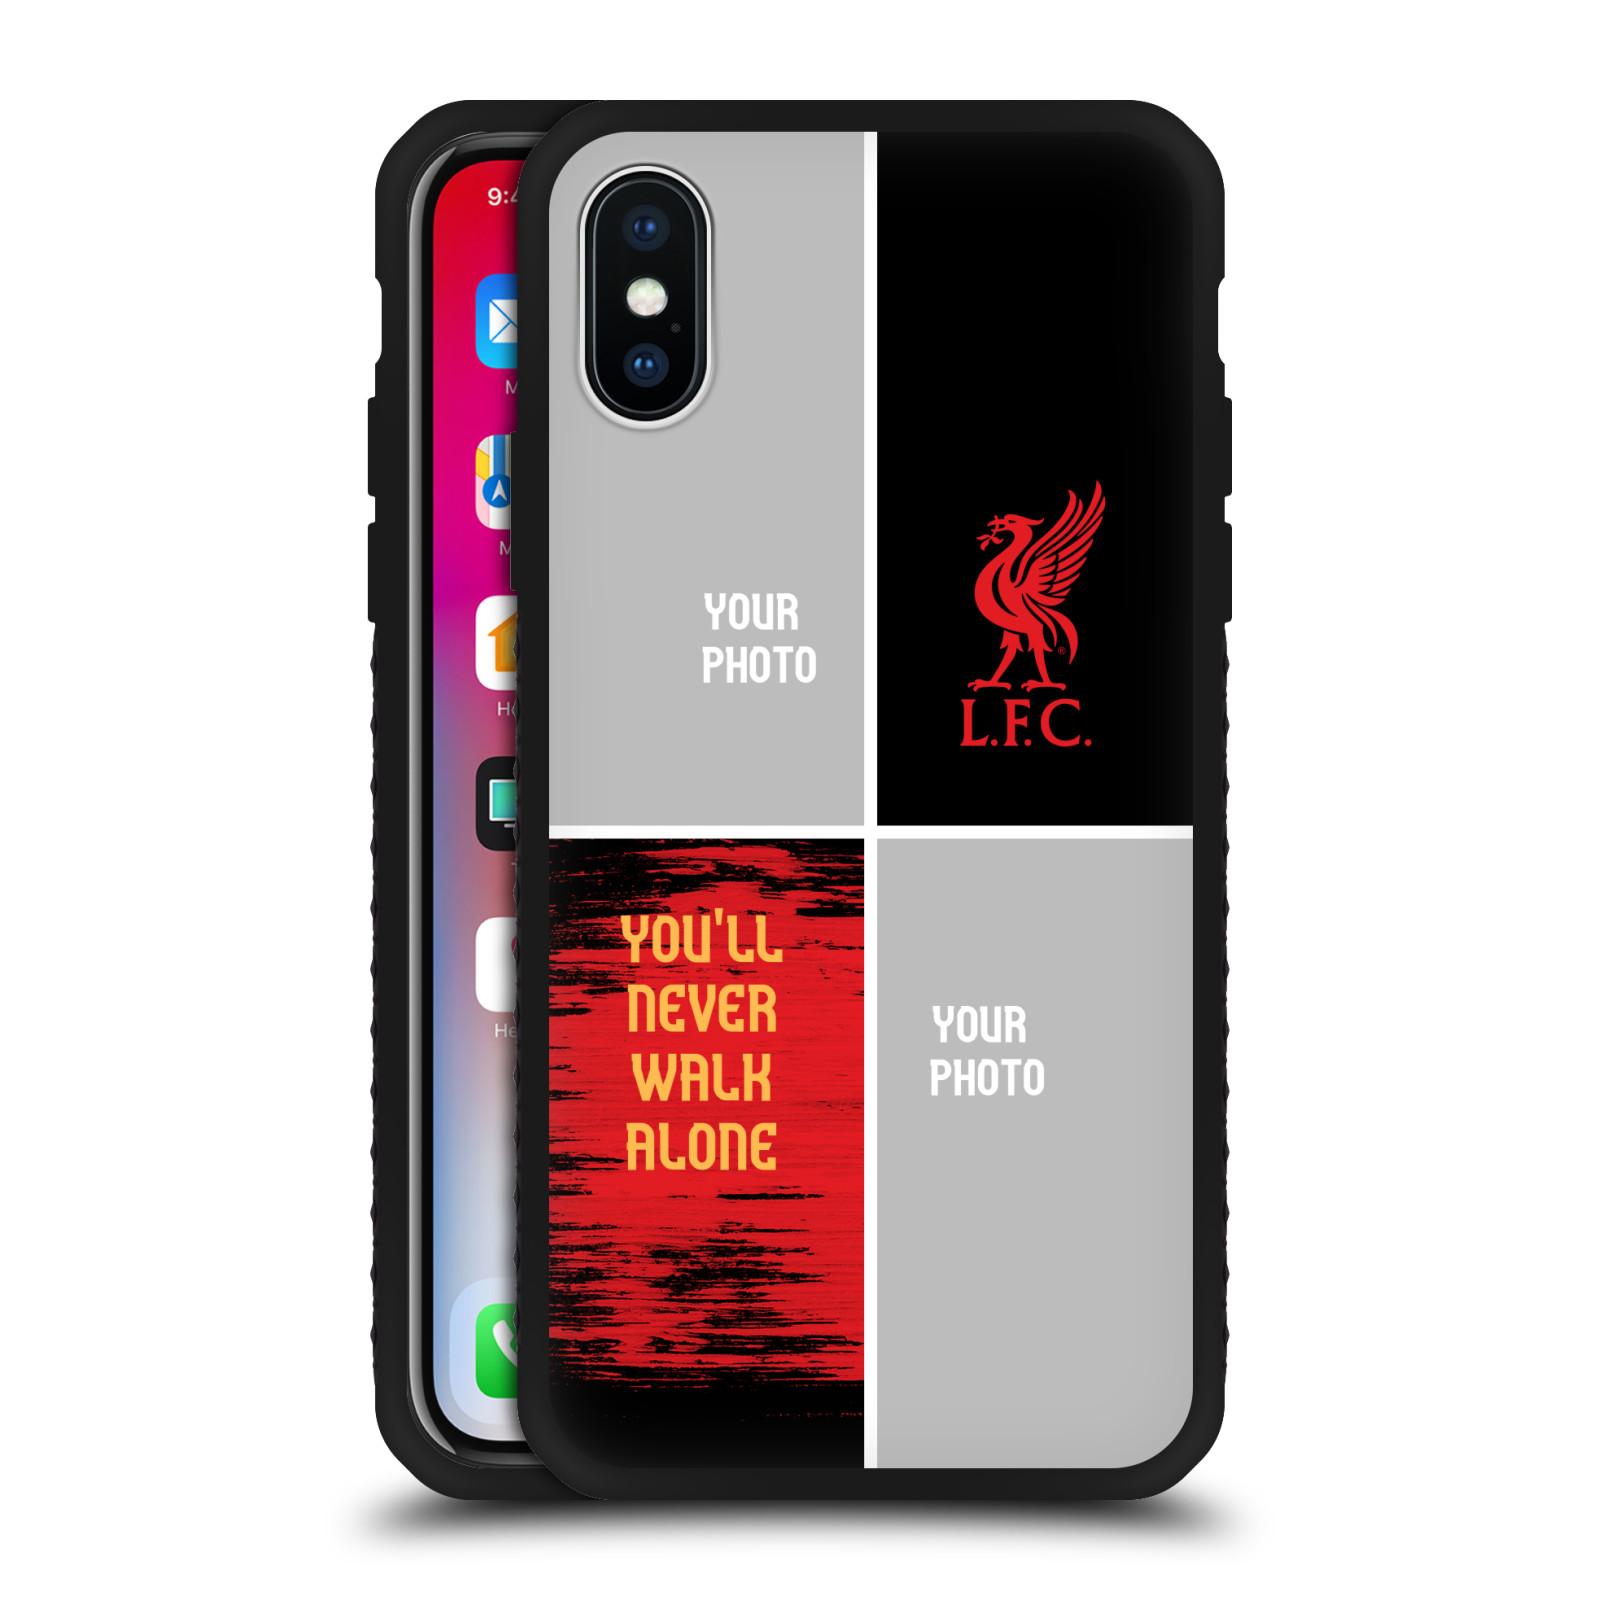 CUSTOM-LIVERPOOL-FOOTBALL-CLUB-2017-18-ARMOUR-LITE-CASE-FOR-APPLE-iPHONE-PHONES